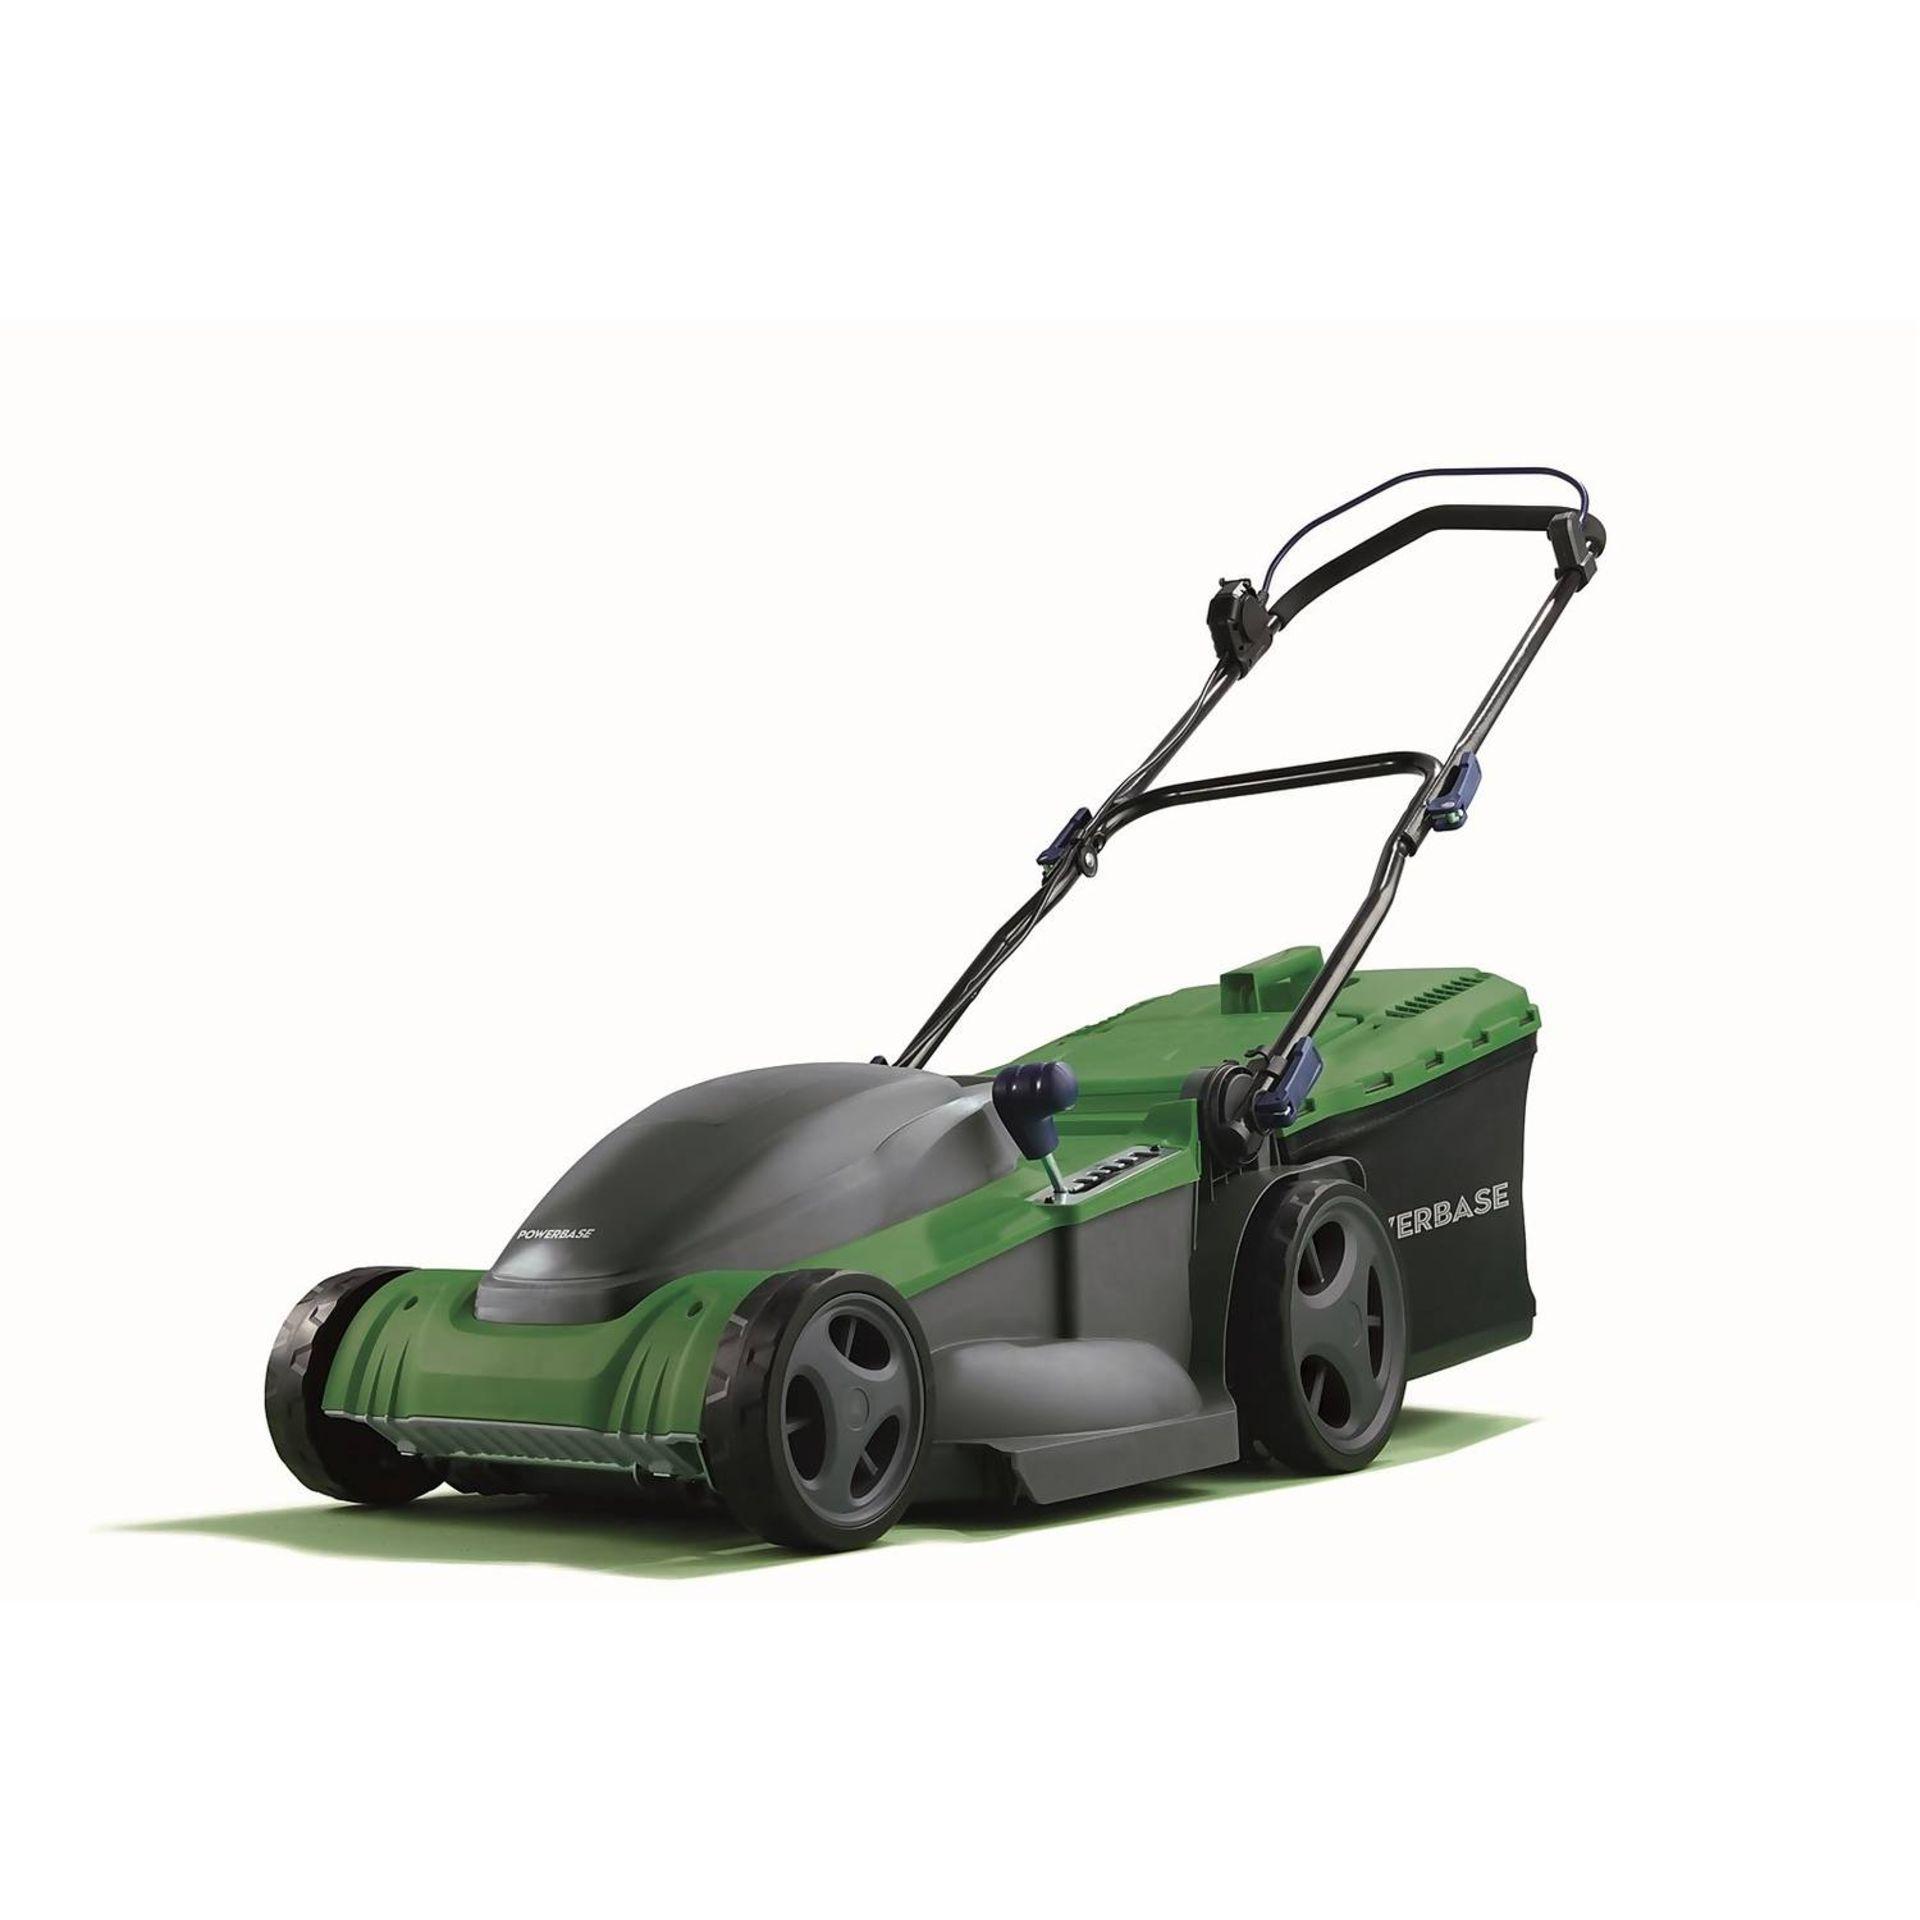 (P2) 2x Powerbase 41cm 1800W Electric Rotary Lawn Mower. RRP £119.00.